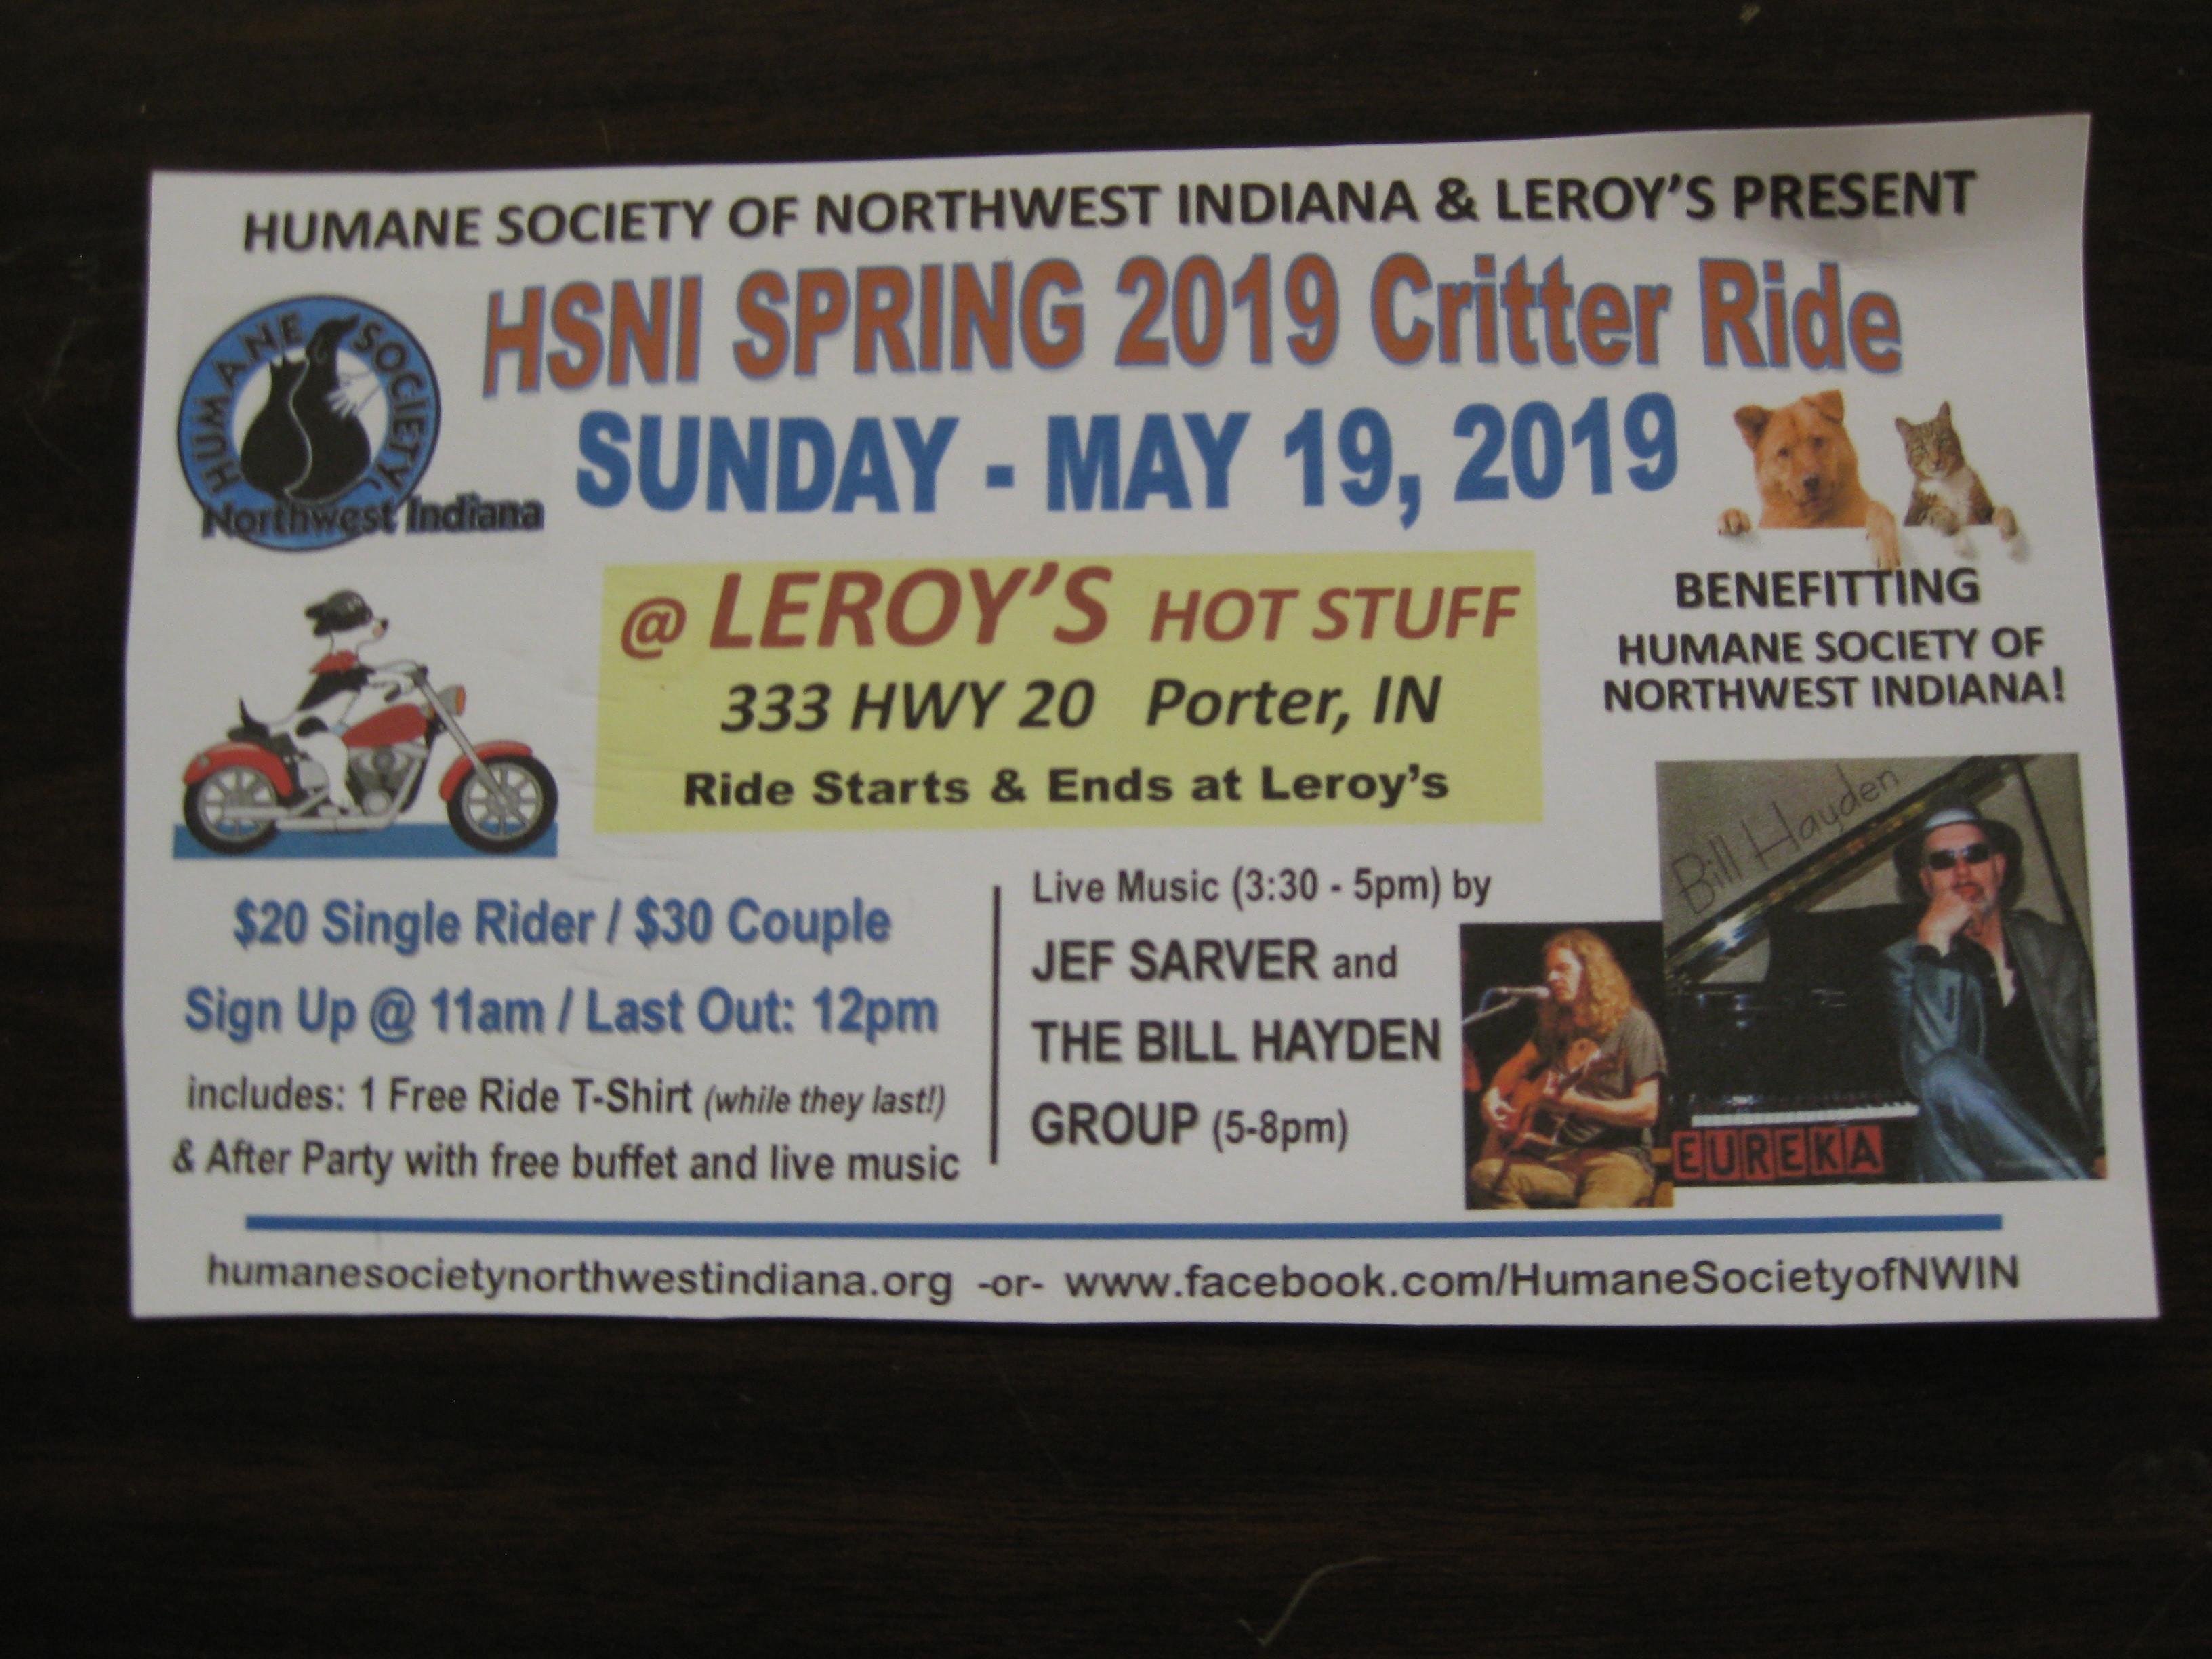 Critter Ride - Petfinder Event Calendar